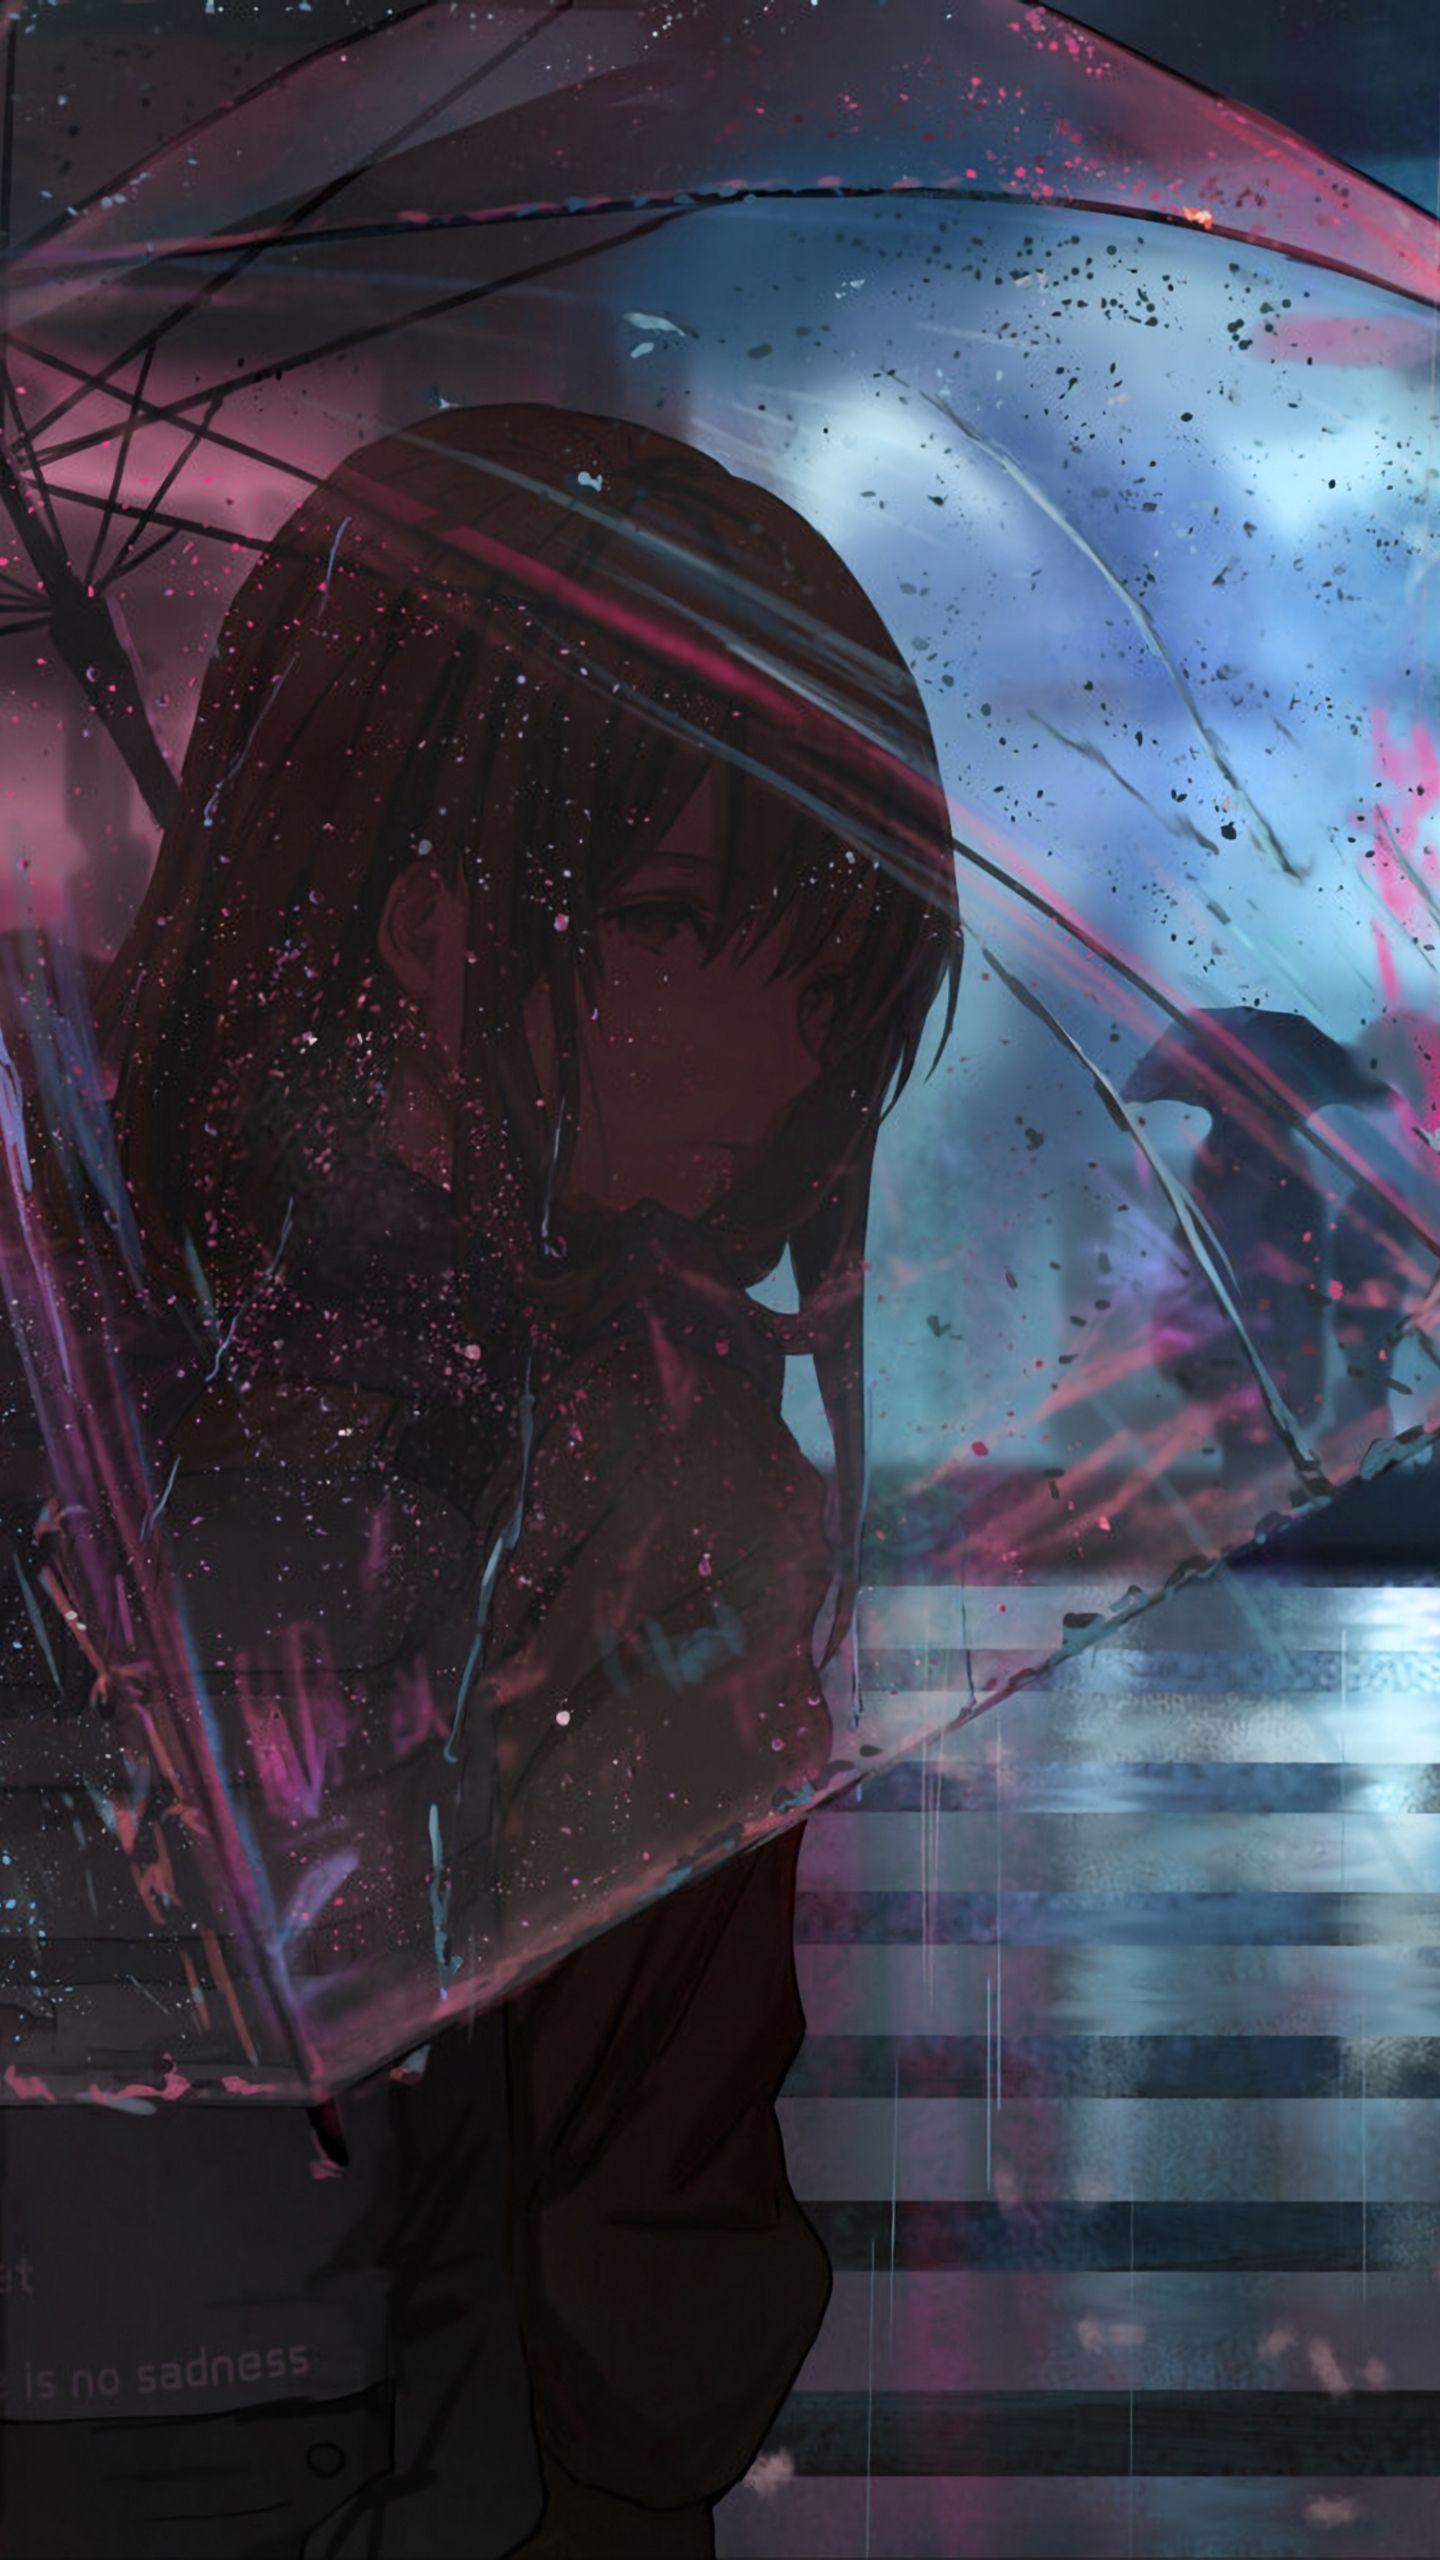 1440x2560 Wallpaper Anime Cobain Wallpaper 1440x2560 3dwallpaperanime Anime Cobain W Anime Tapete Dark Anime Traurige Kunst